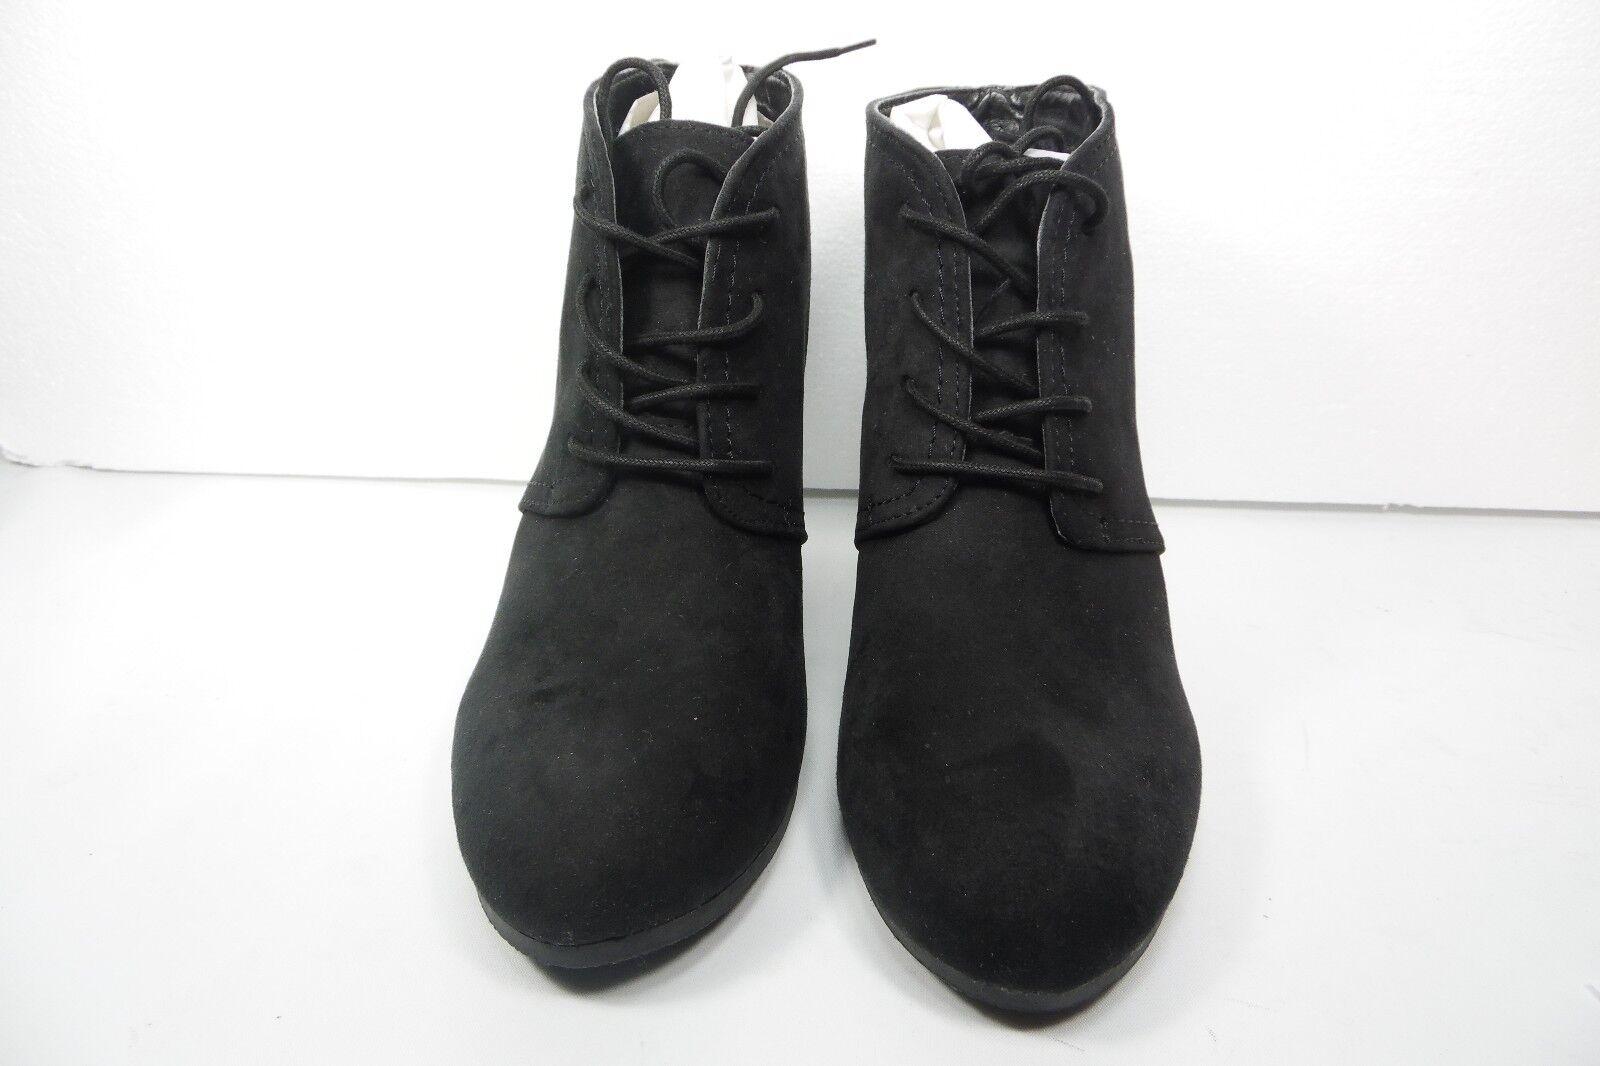 Arizona Jean Co.  Lacie Wedge Women's Bootie  Suede Black Size 10 M